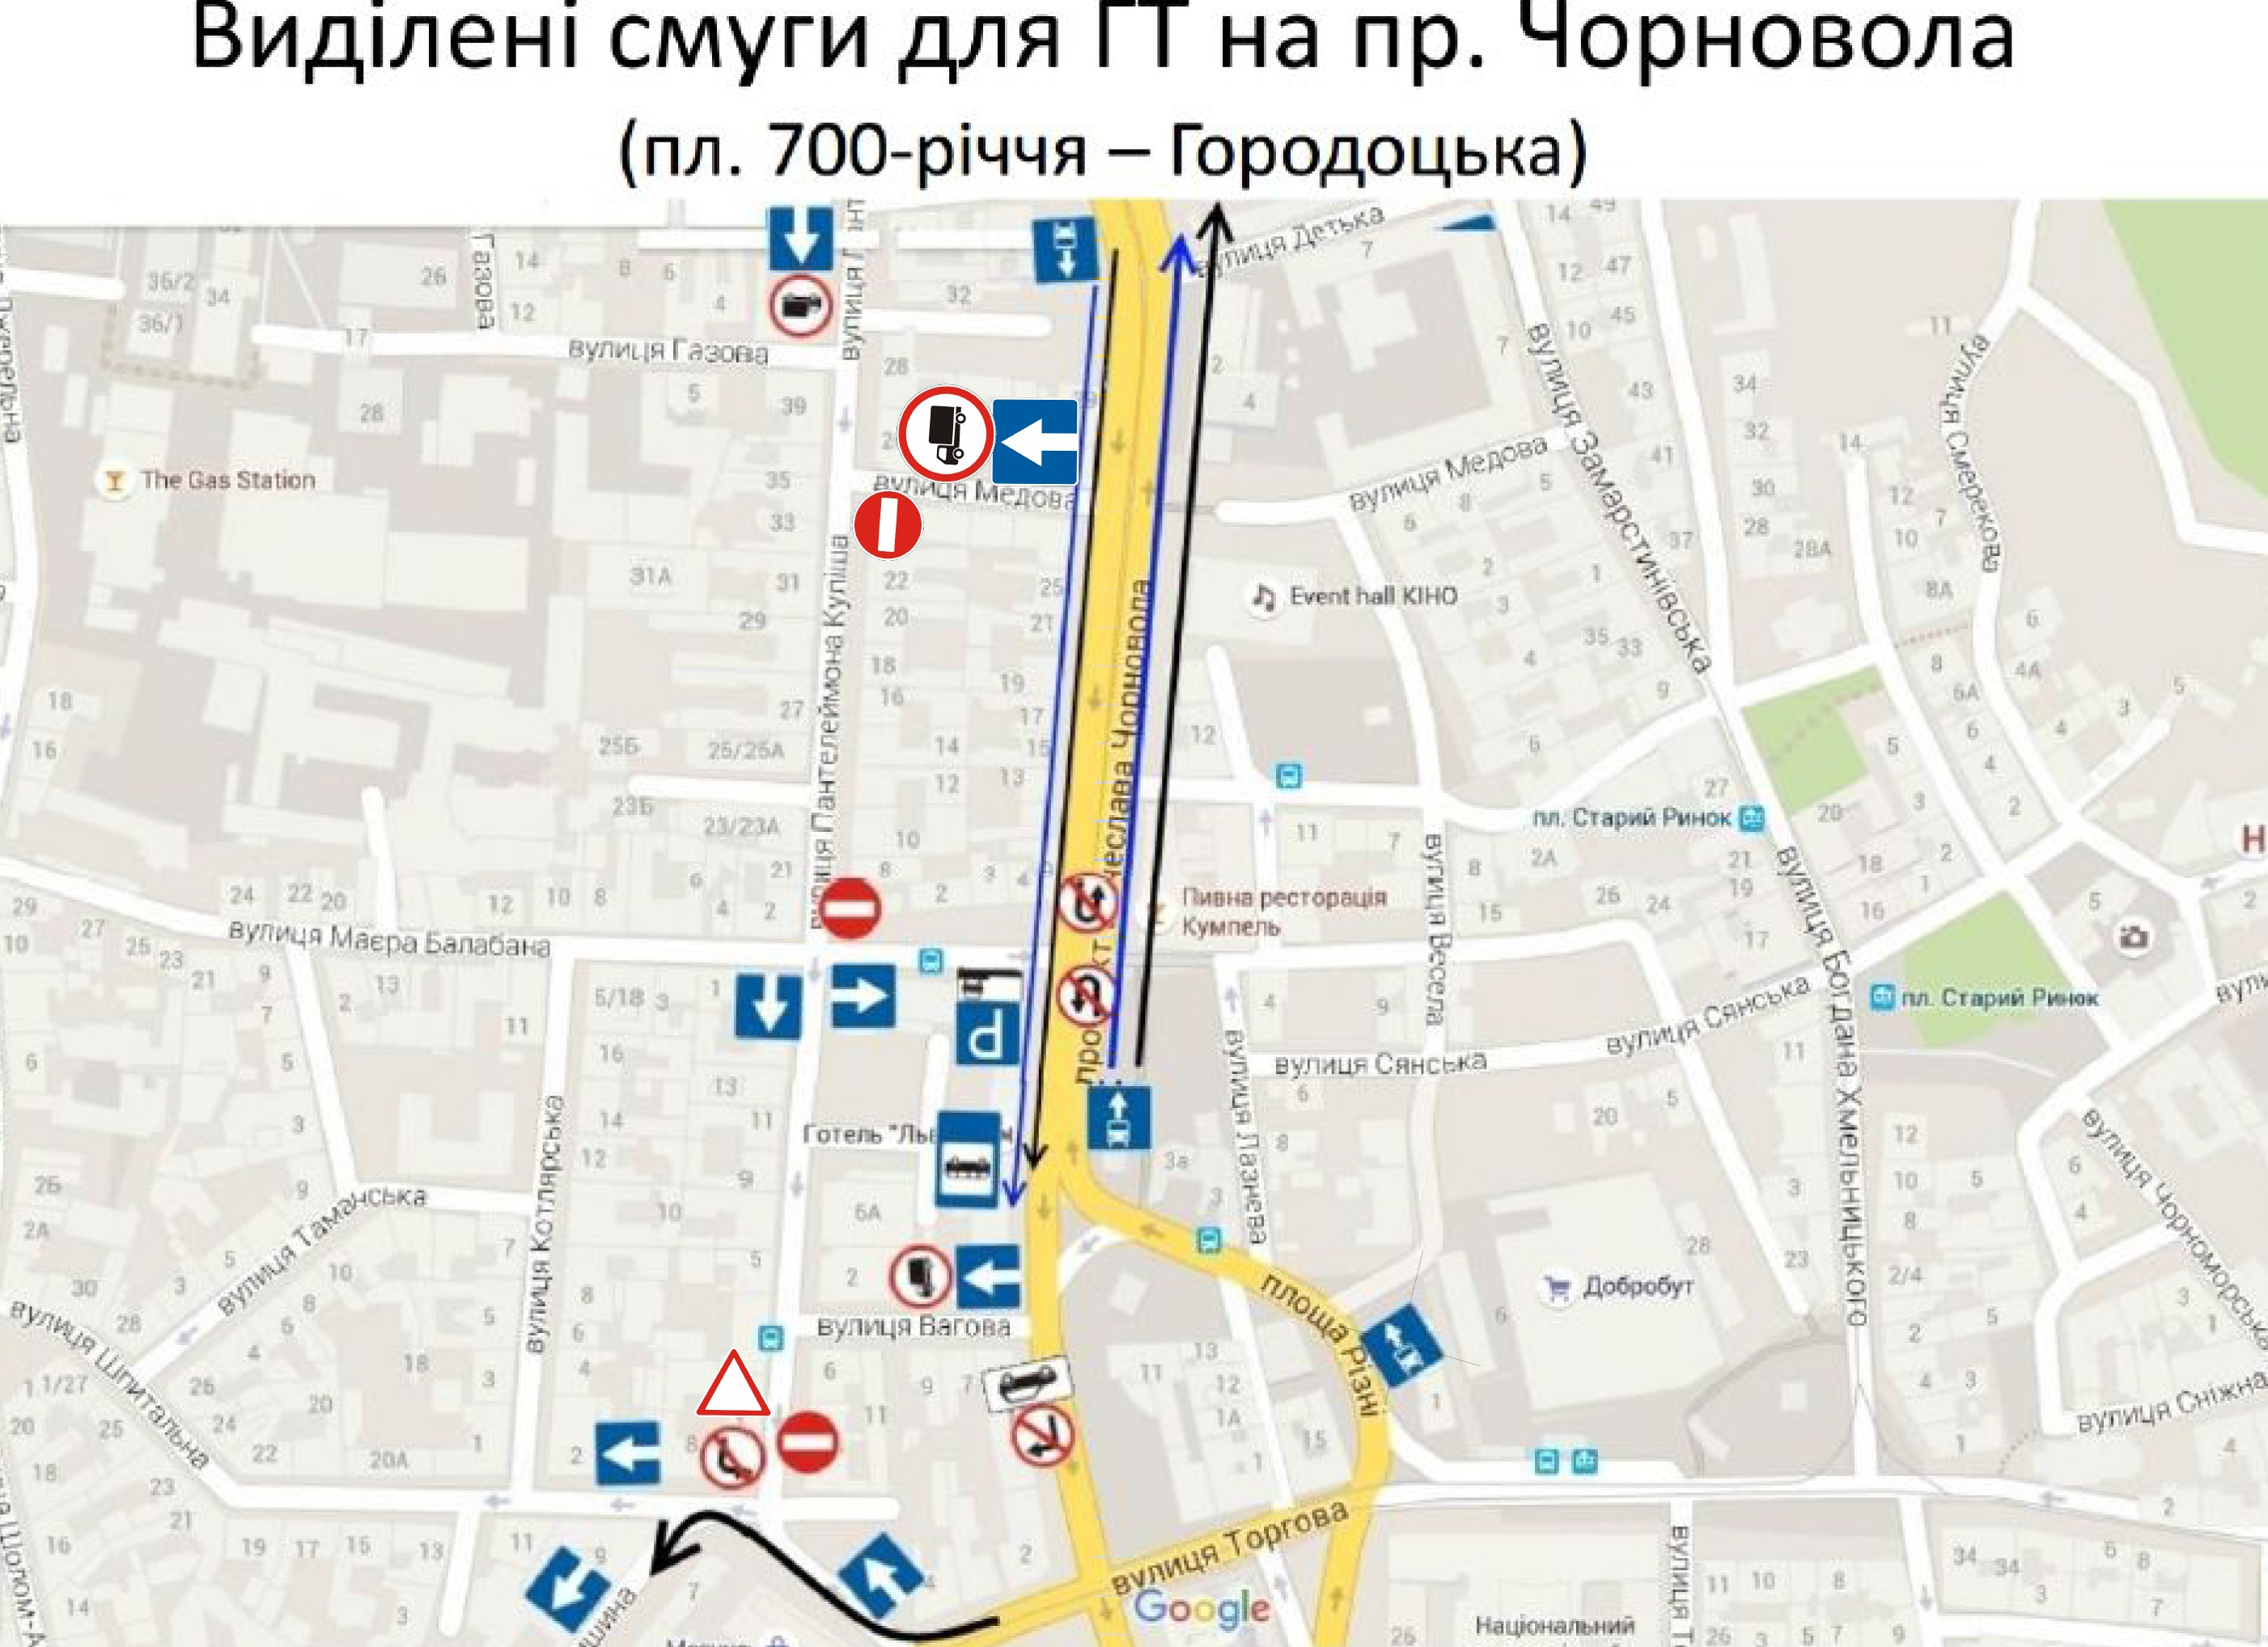 Схема маршруток львова 2013 фото 33